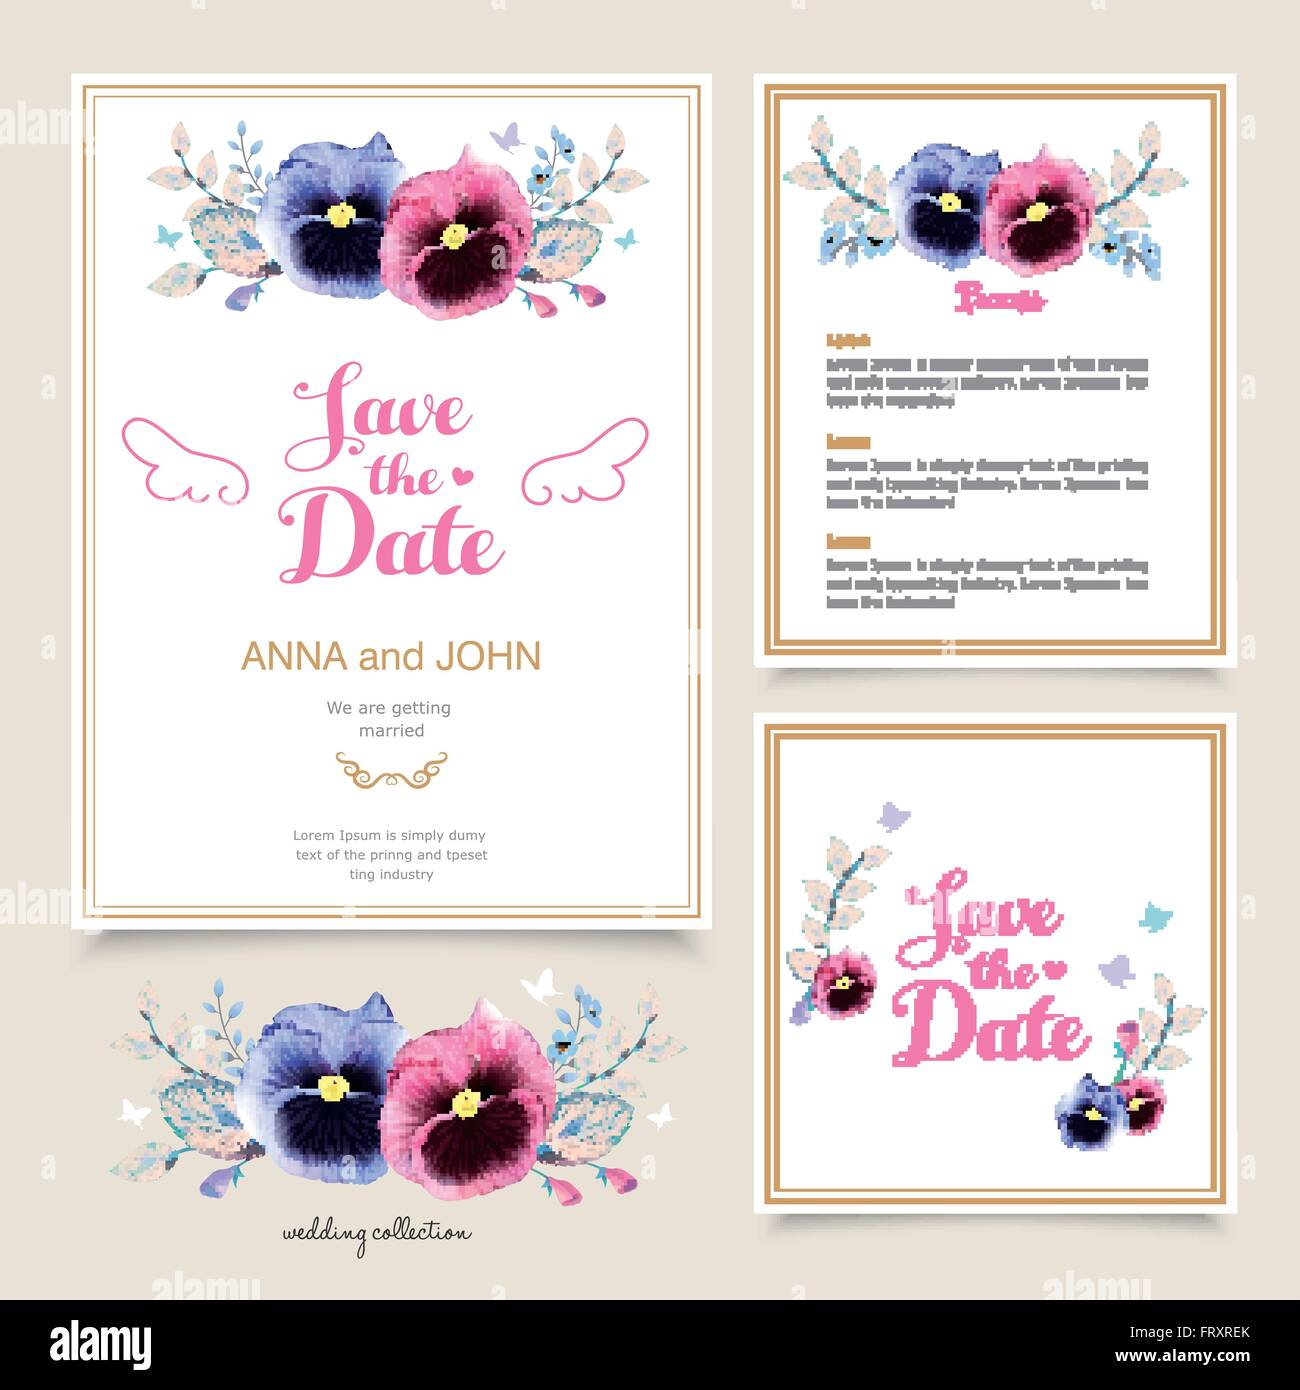 romantic pansy wedding invitation template design in watercolor ...